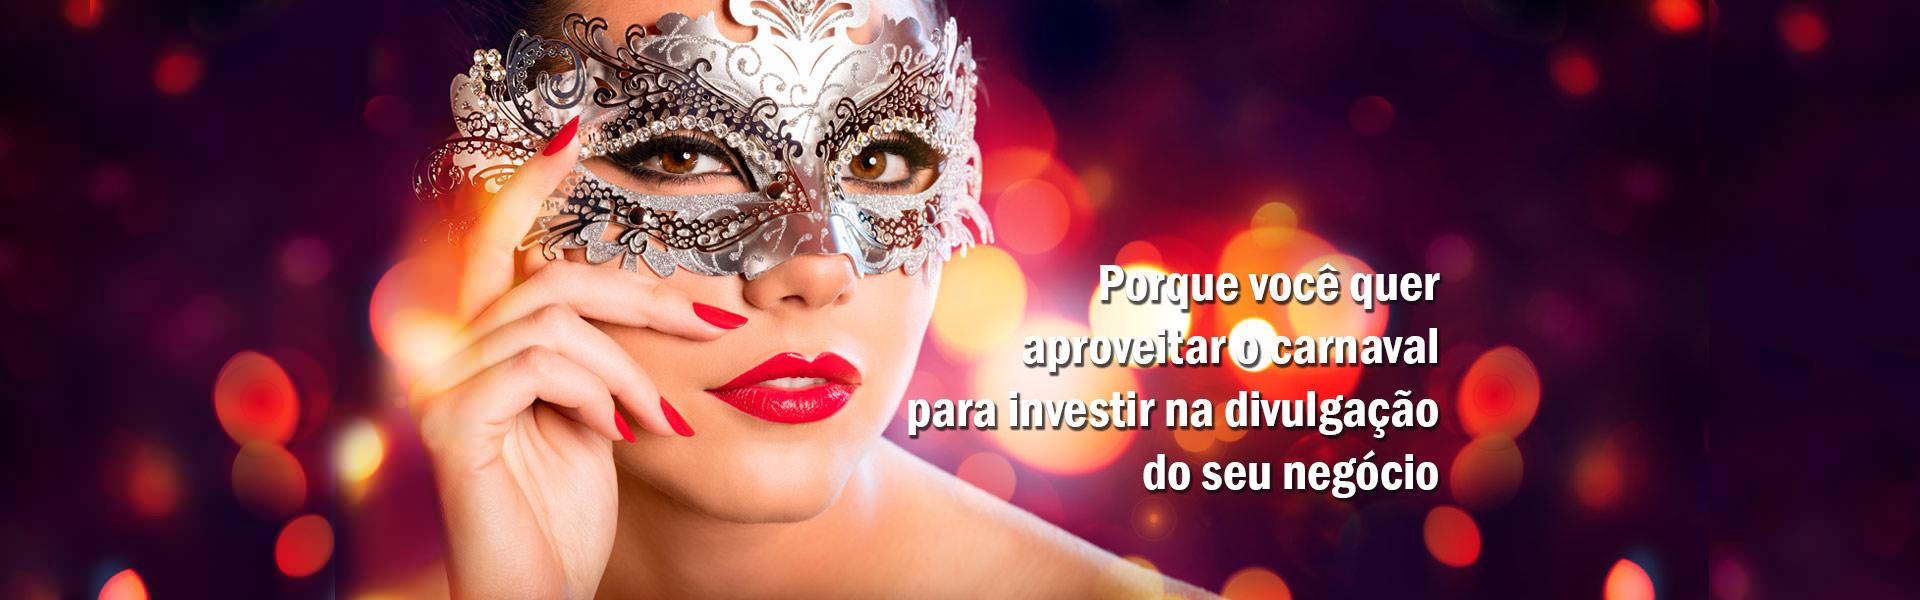 carnaval_01